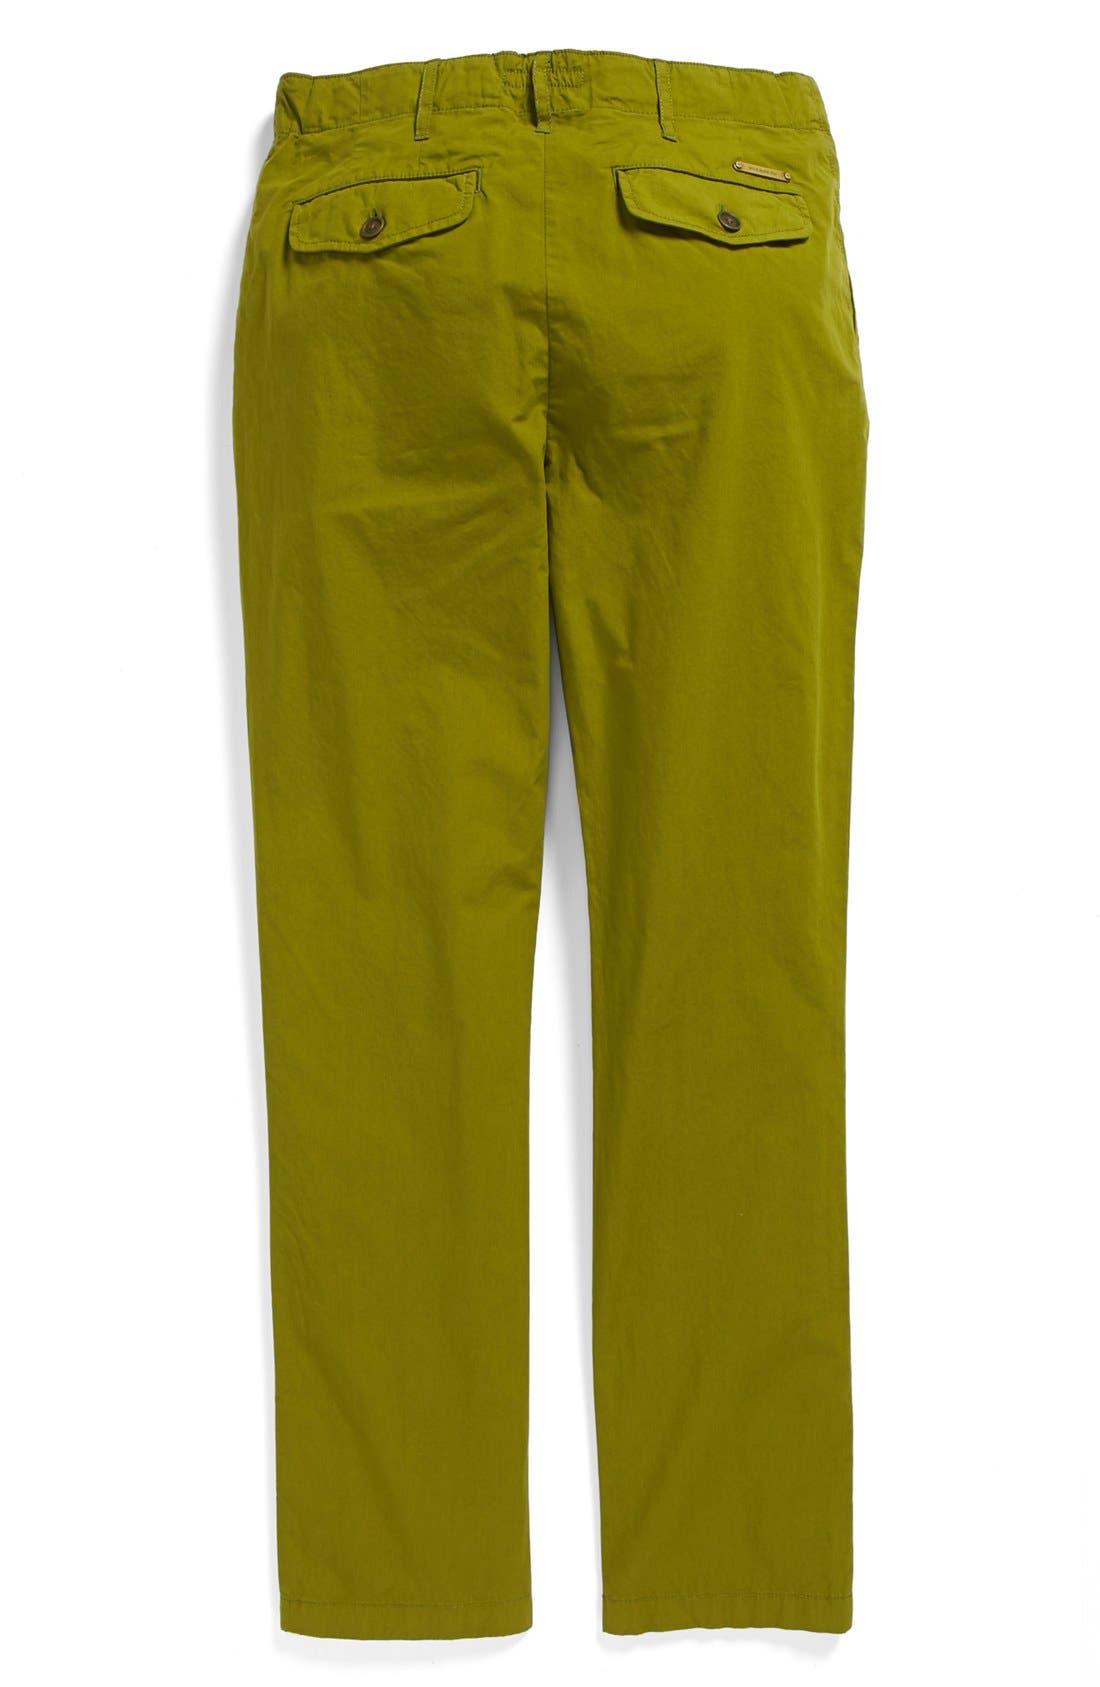 Alternate Image 2  - Burberry Straight Leg Pants (Toddler Boys, Little Boys & Big Boys)